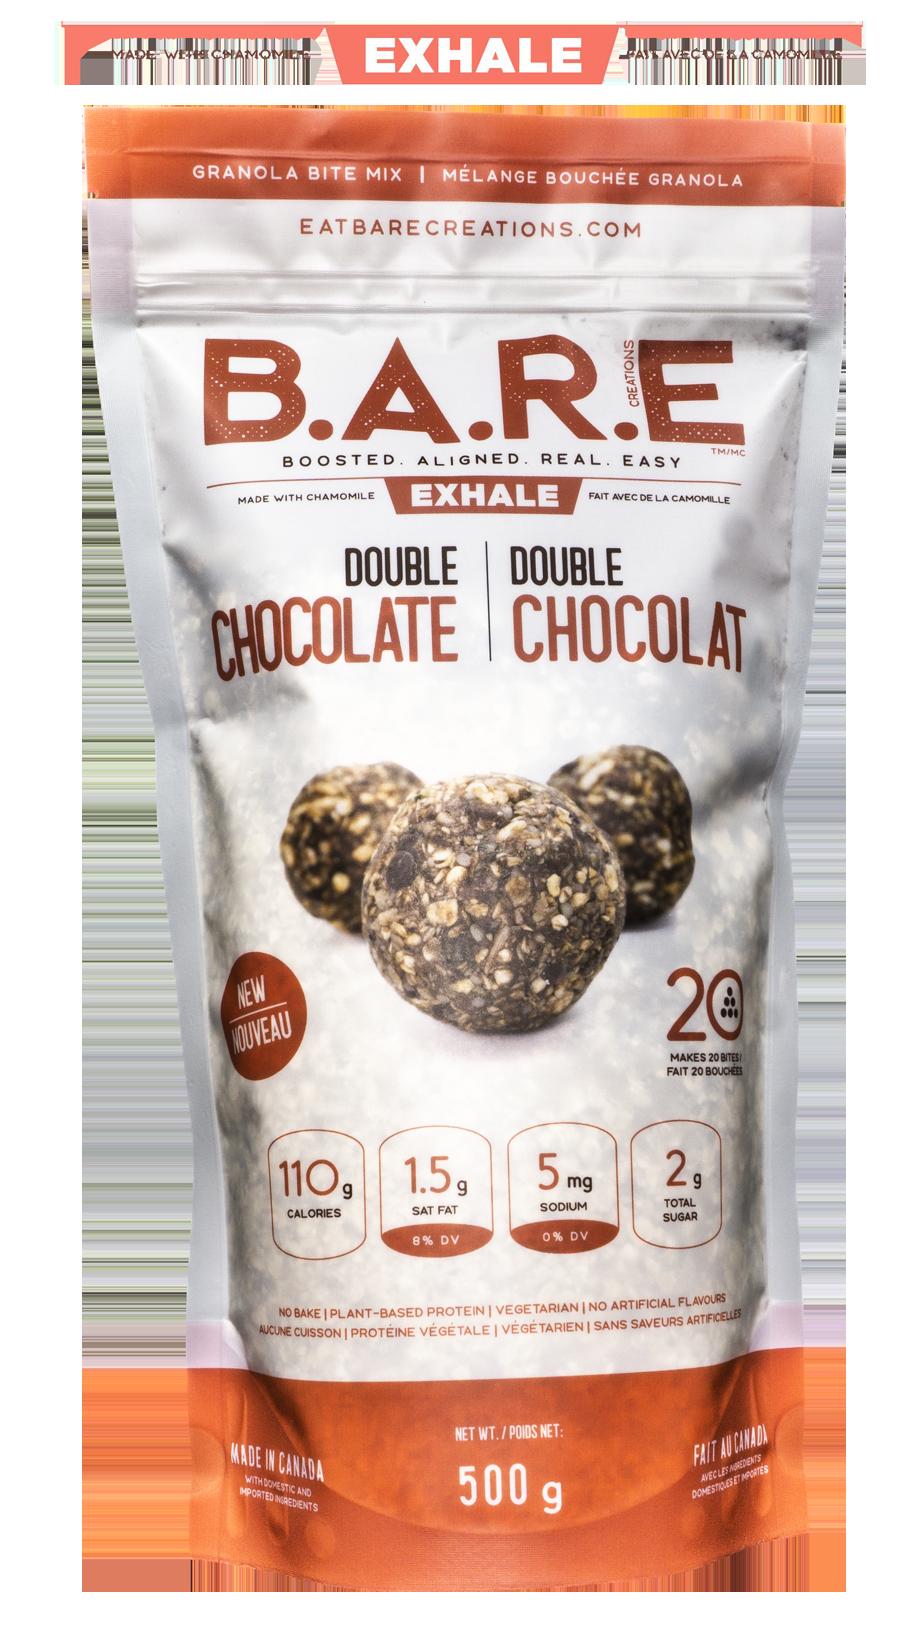 Double Chocolate Chamomile Granola Bite Mix